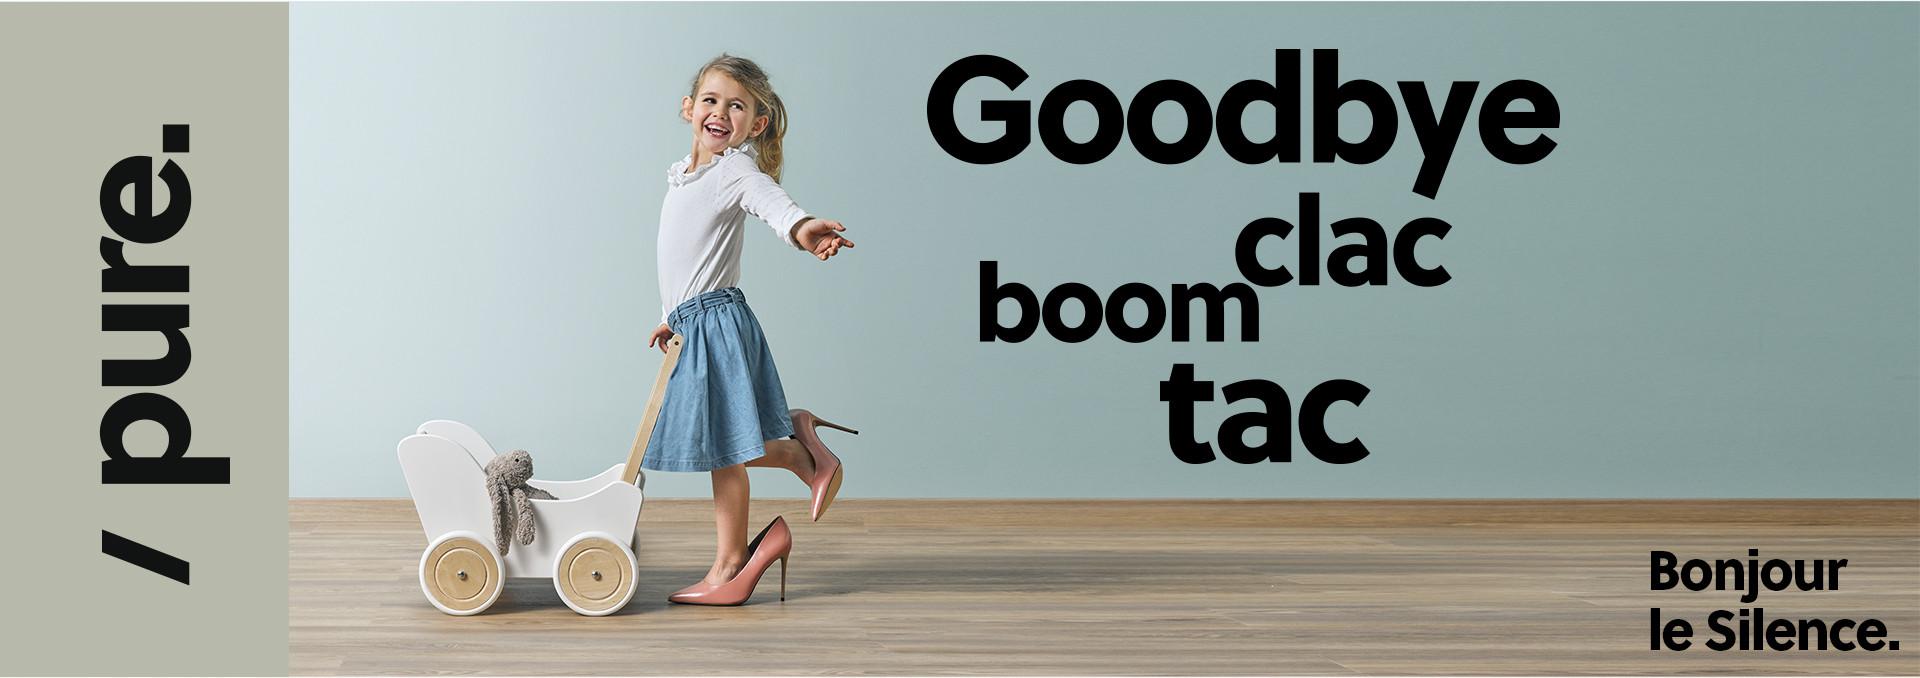 Banner enfant à talons, Goodbye clac boom tac, Bonjour le silence